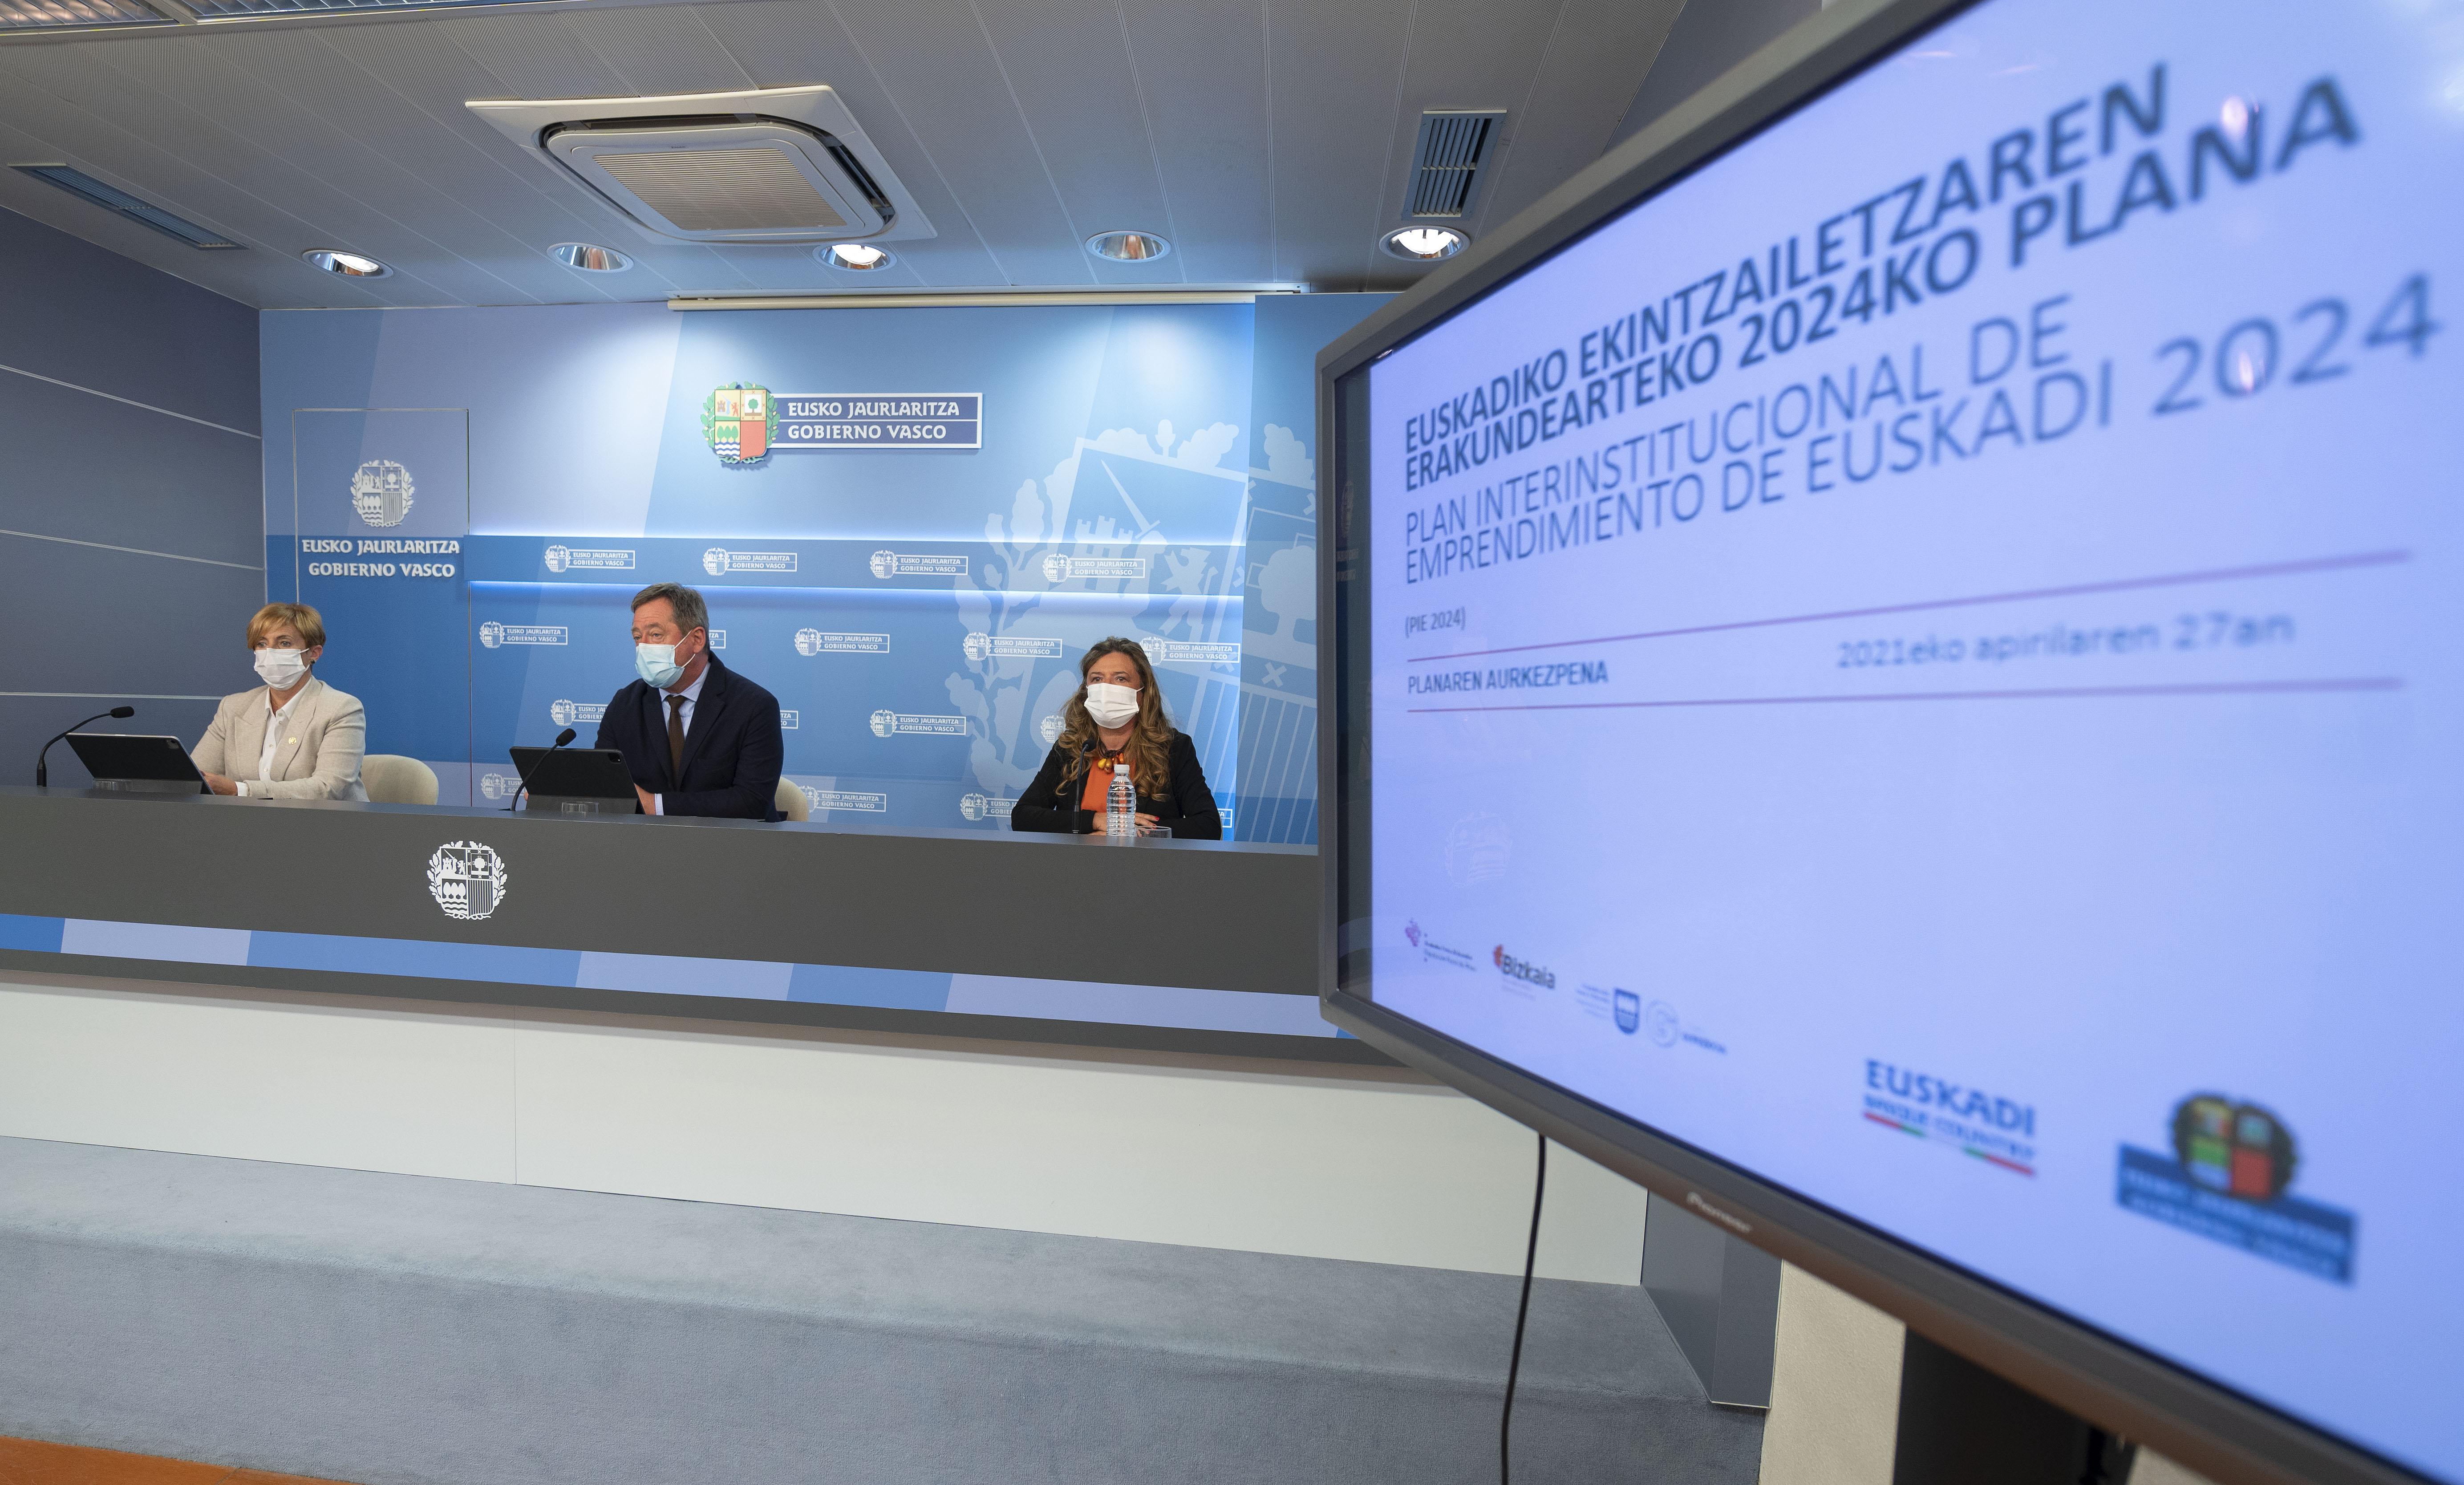 2021_04_27_consejo_gobierno_04.jpg